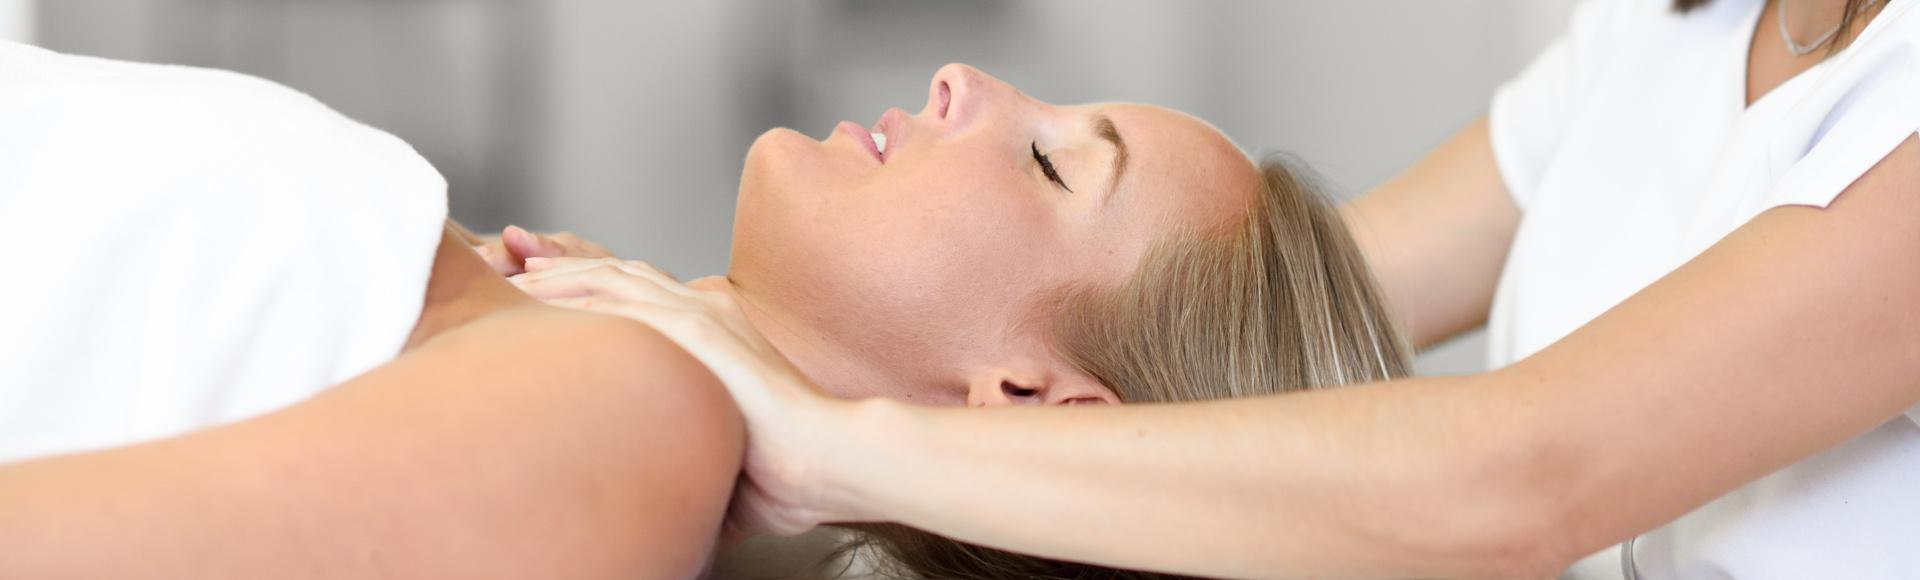 Fyzioterapie Prostějov